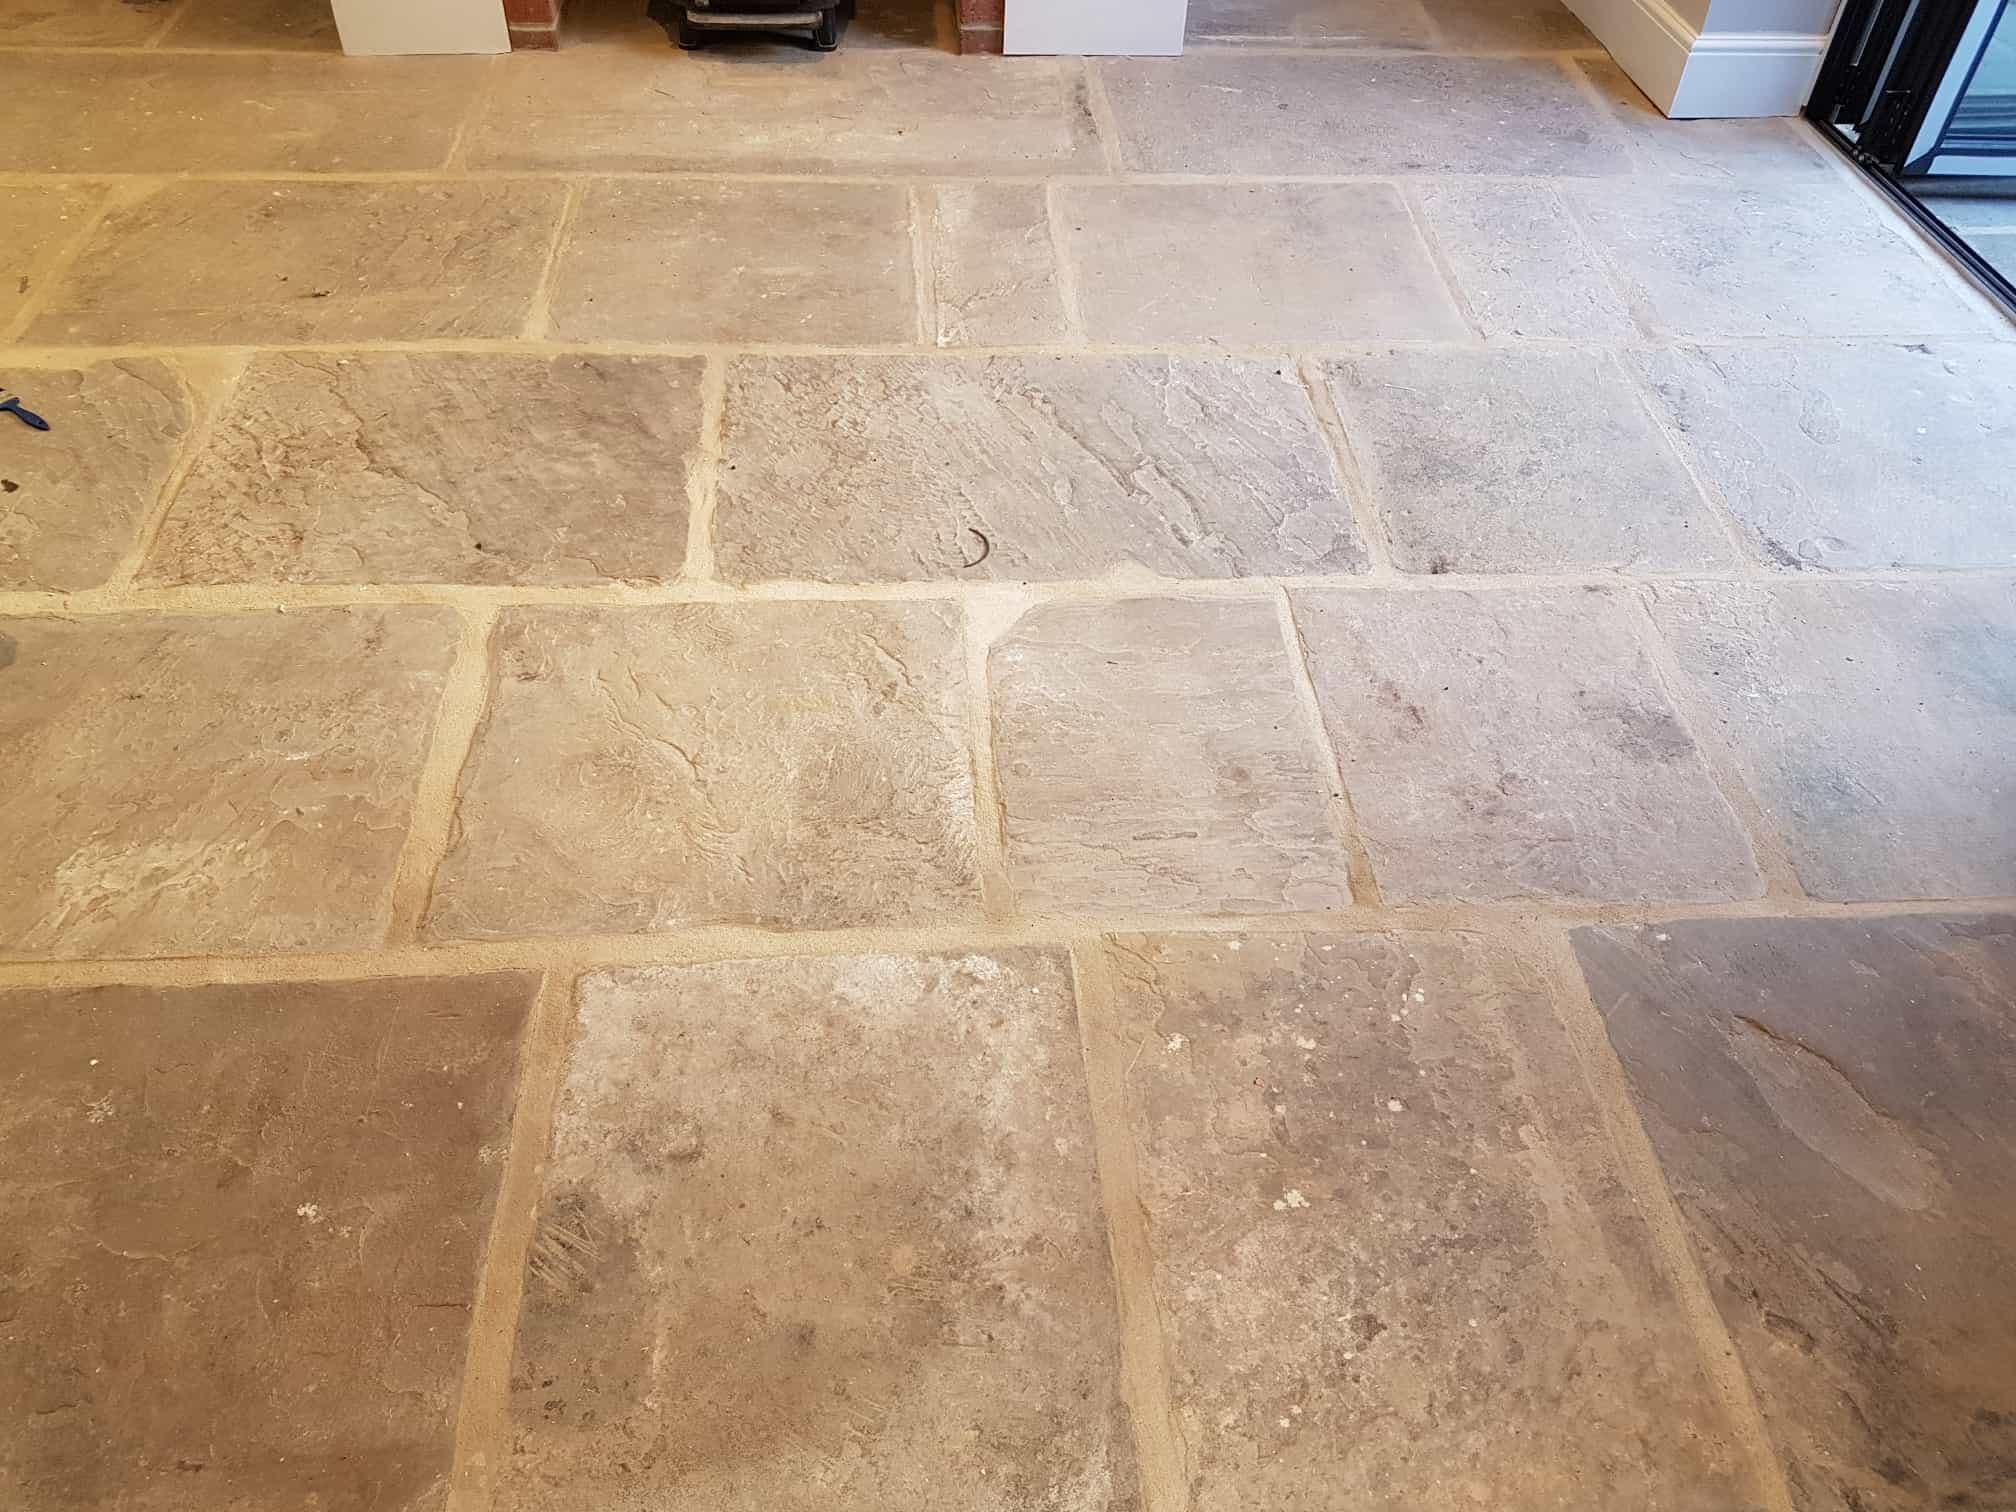 Yorkshire stone flagstone floor before renovation Harrogate